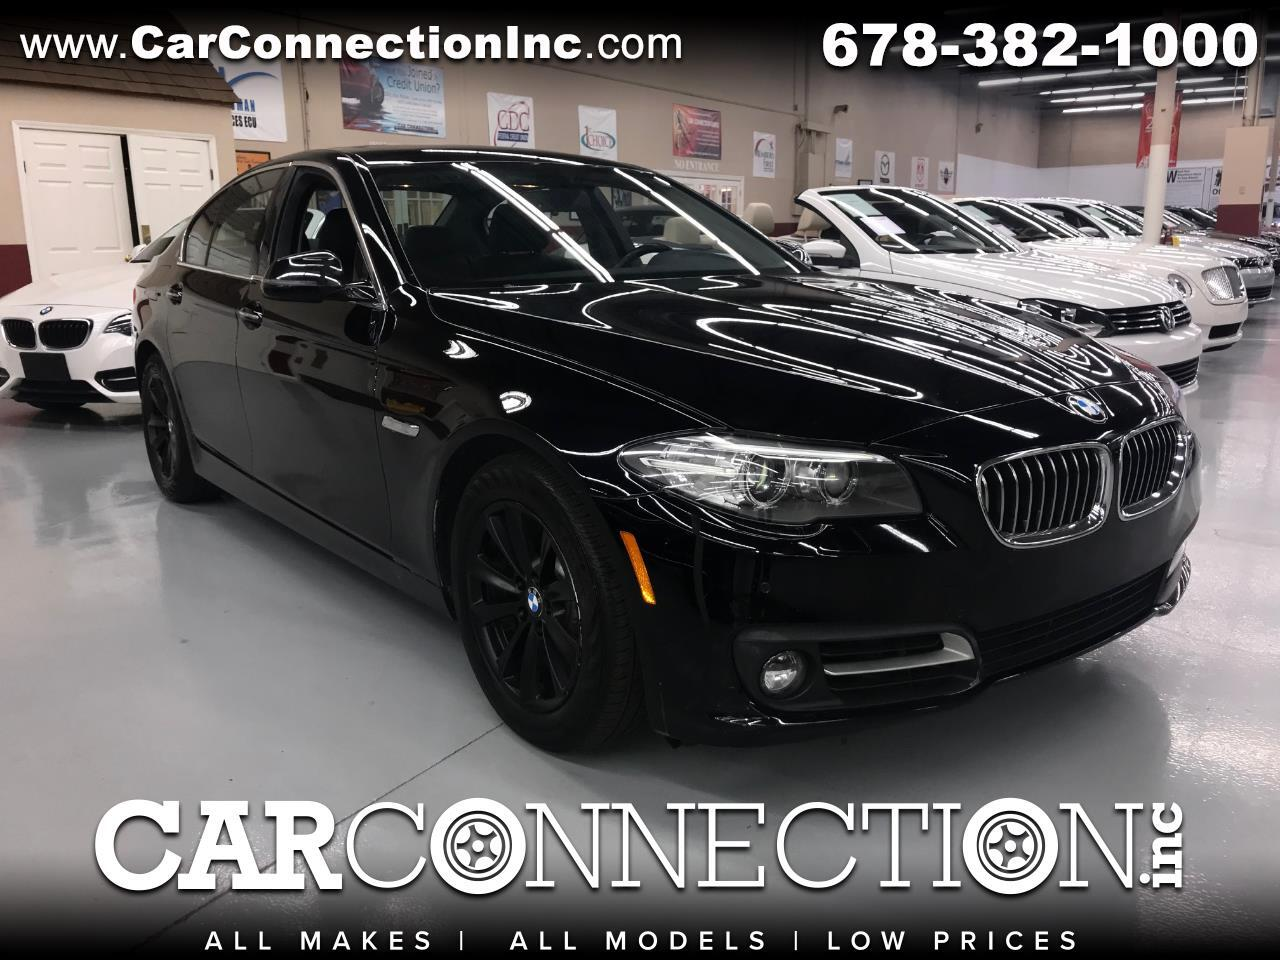 2016 BMW 5 Series 528I Luxury